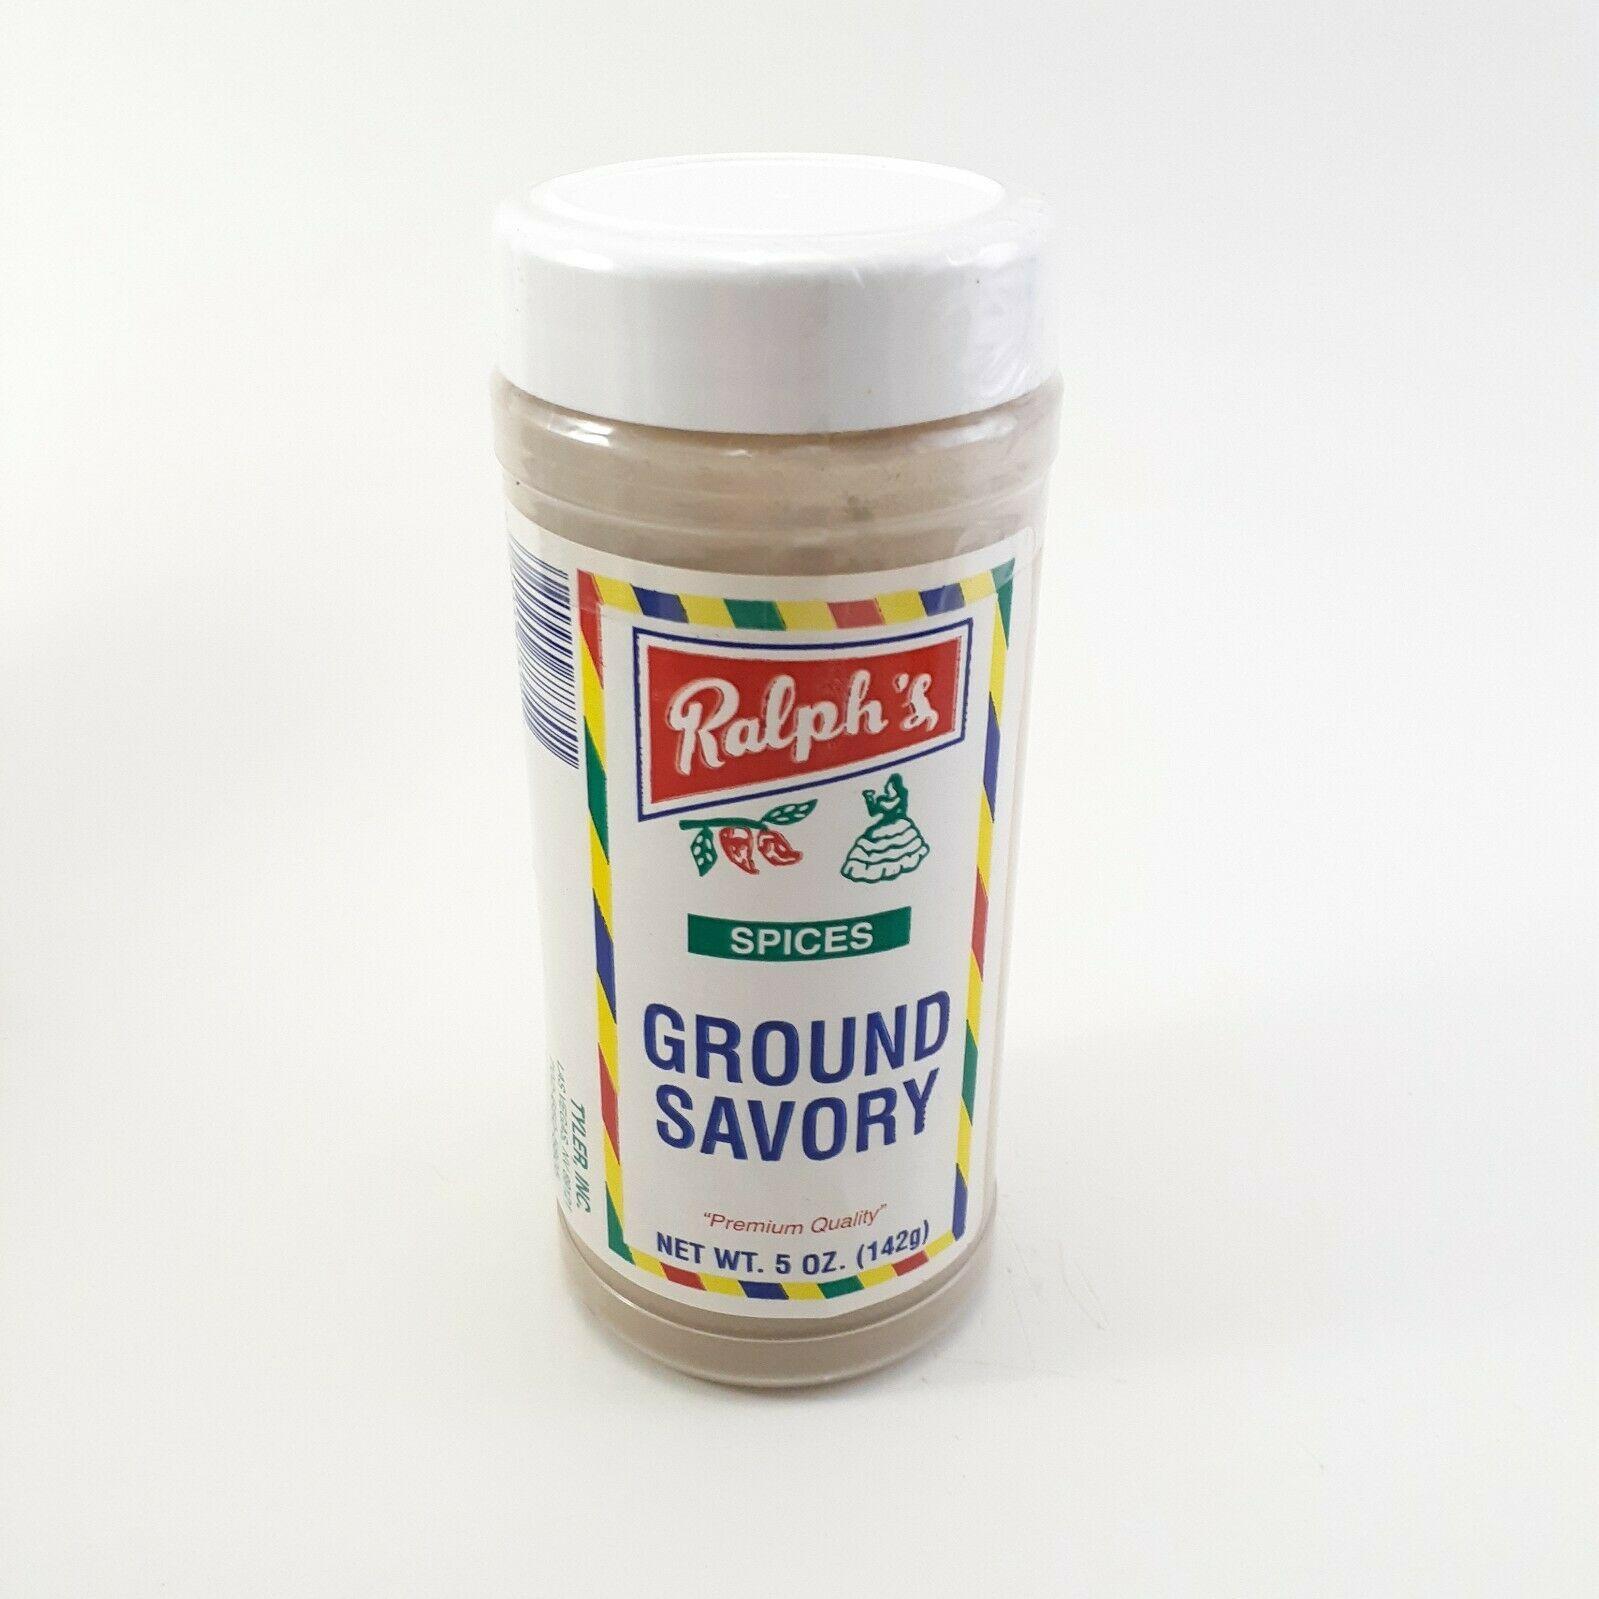 Ground Savory 5 Oz Ralph's Spices Premium Quality